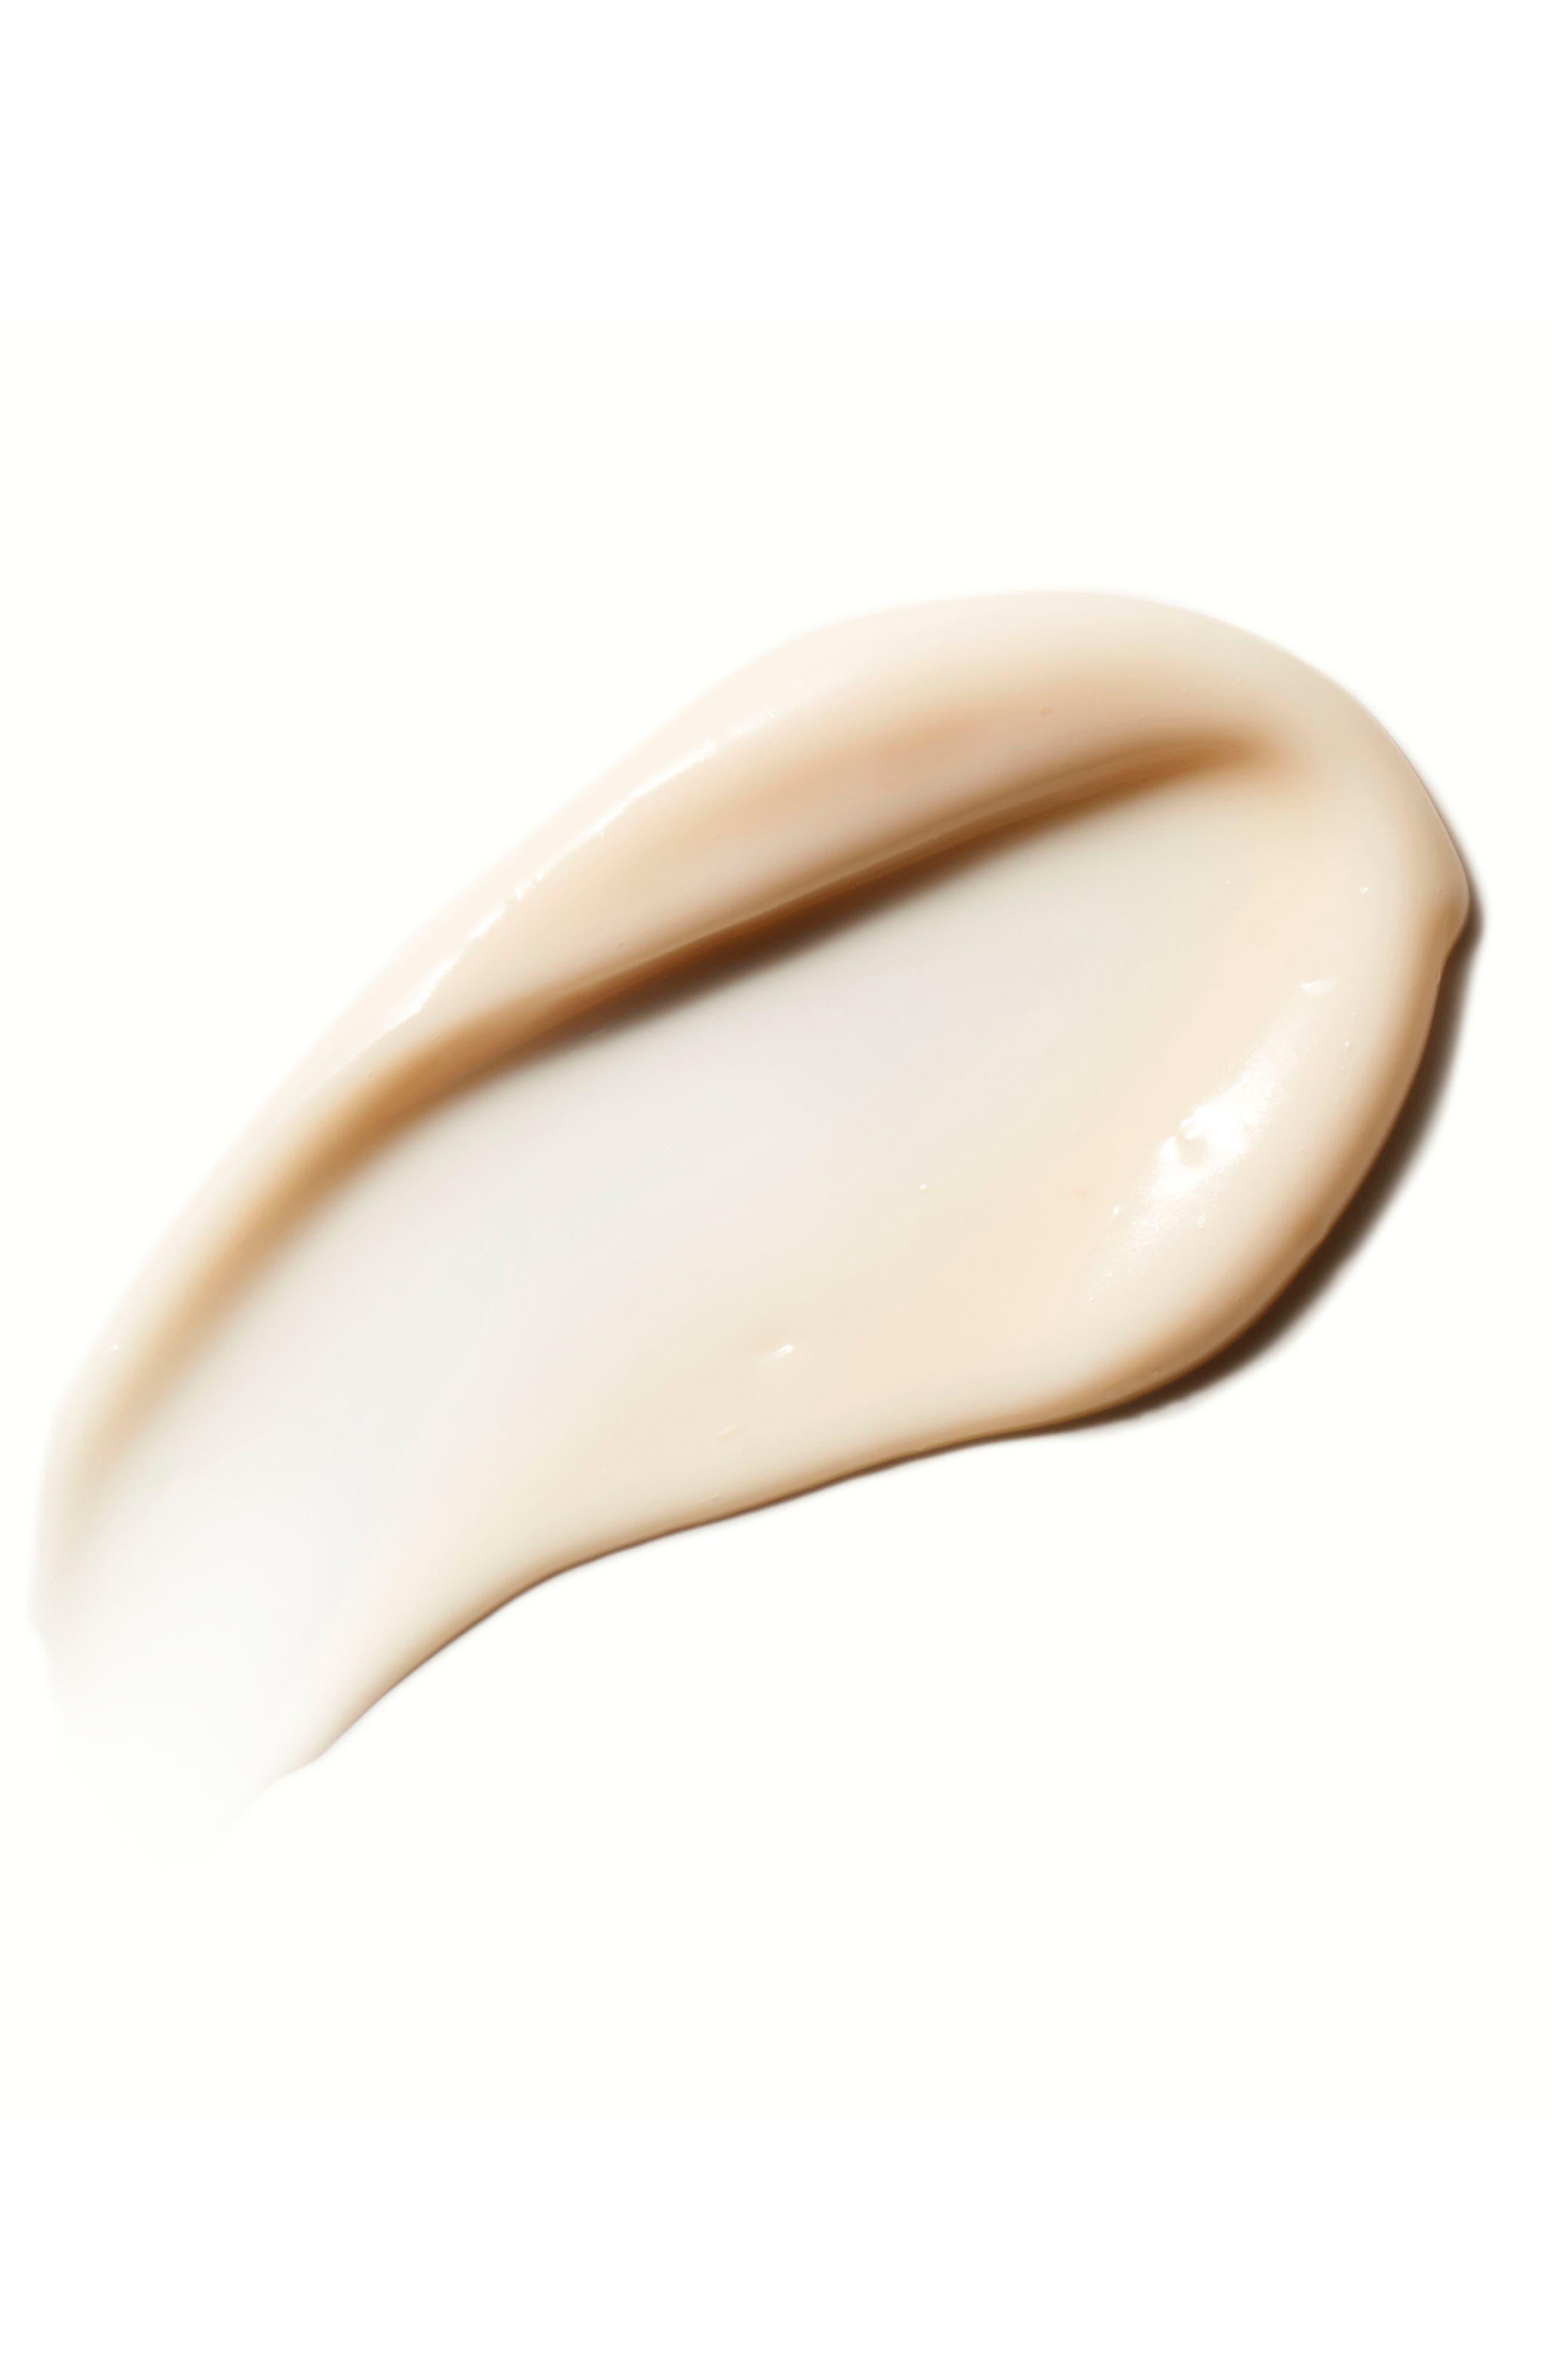 Rejuvenating Hand Cream,                             Alternate thumbnail 2, color,                             No Color